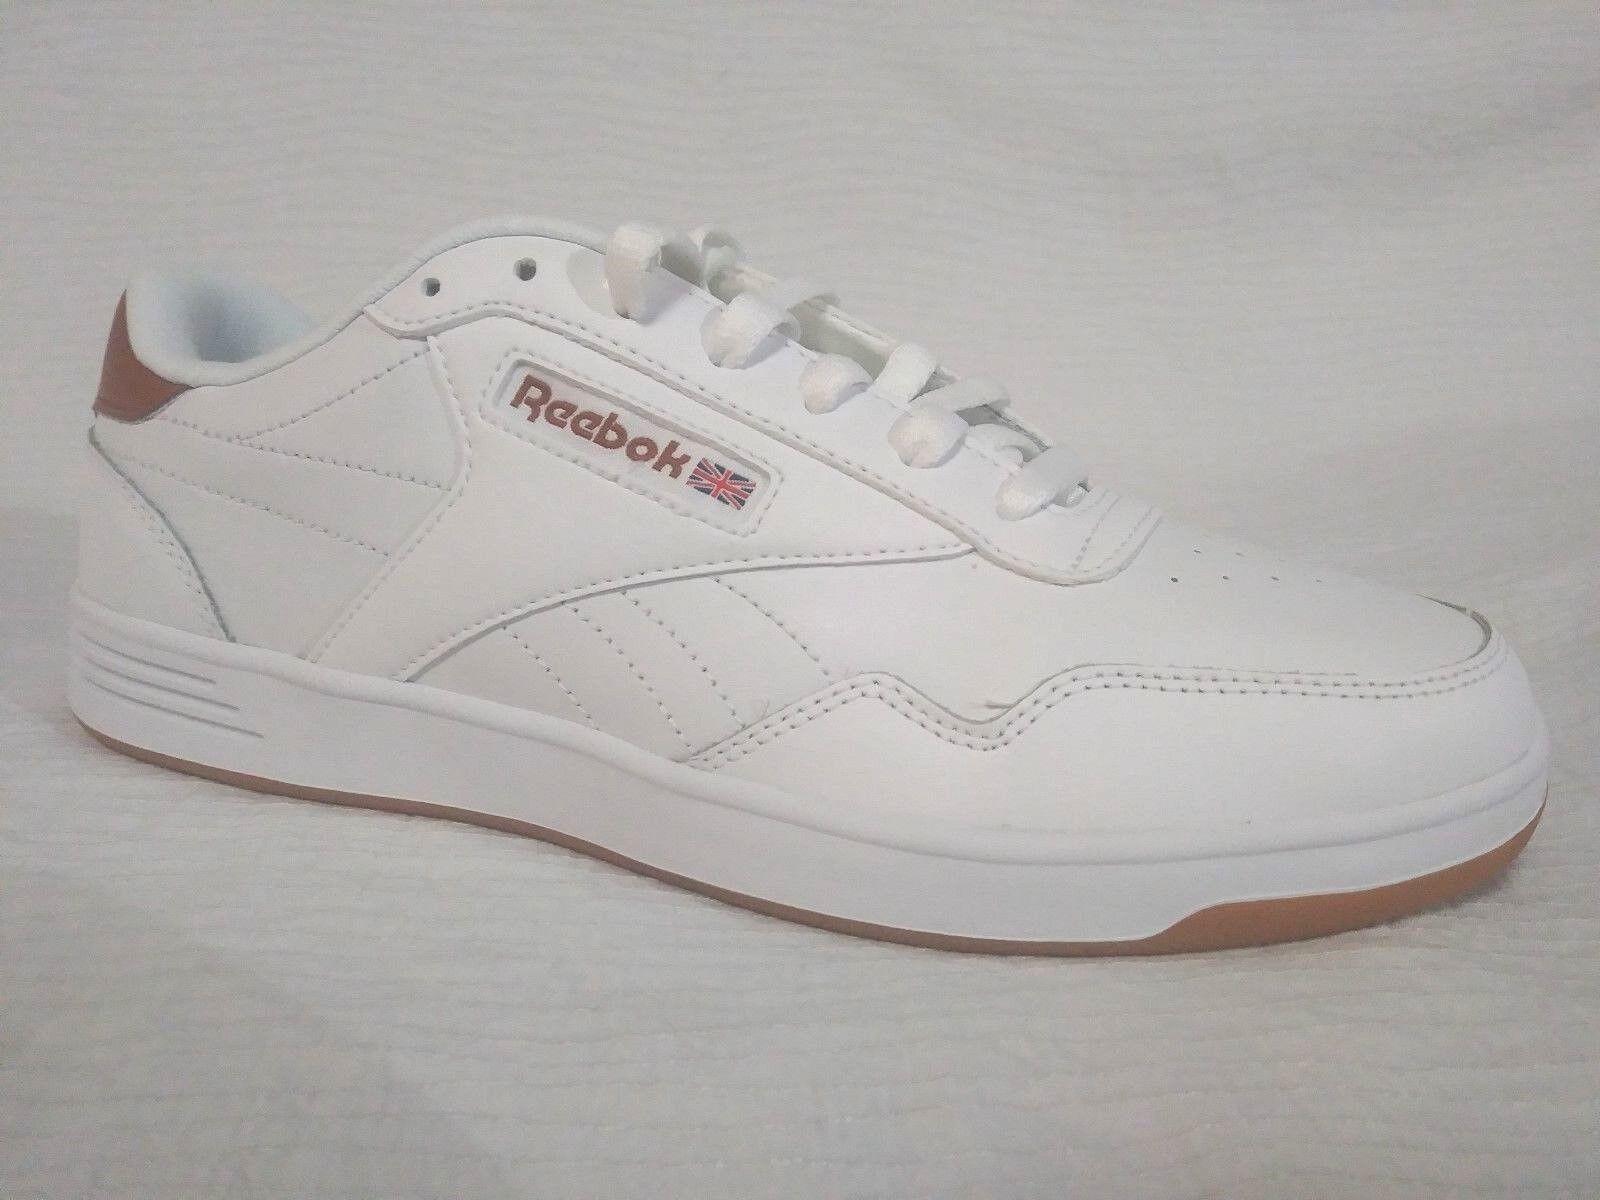 New Reebok Club Memt Classic Mens Size 9 White Gum Sole BS9011